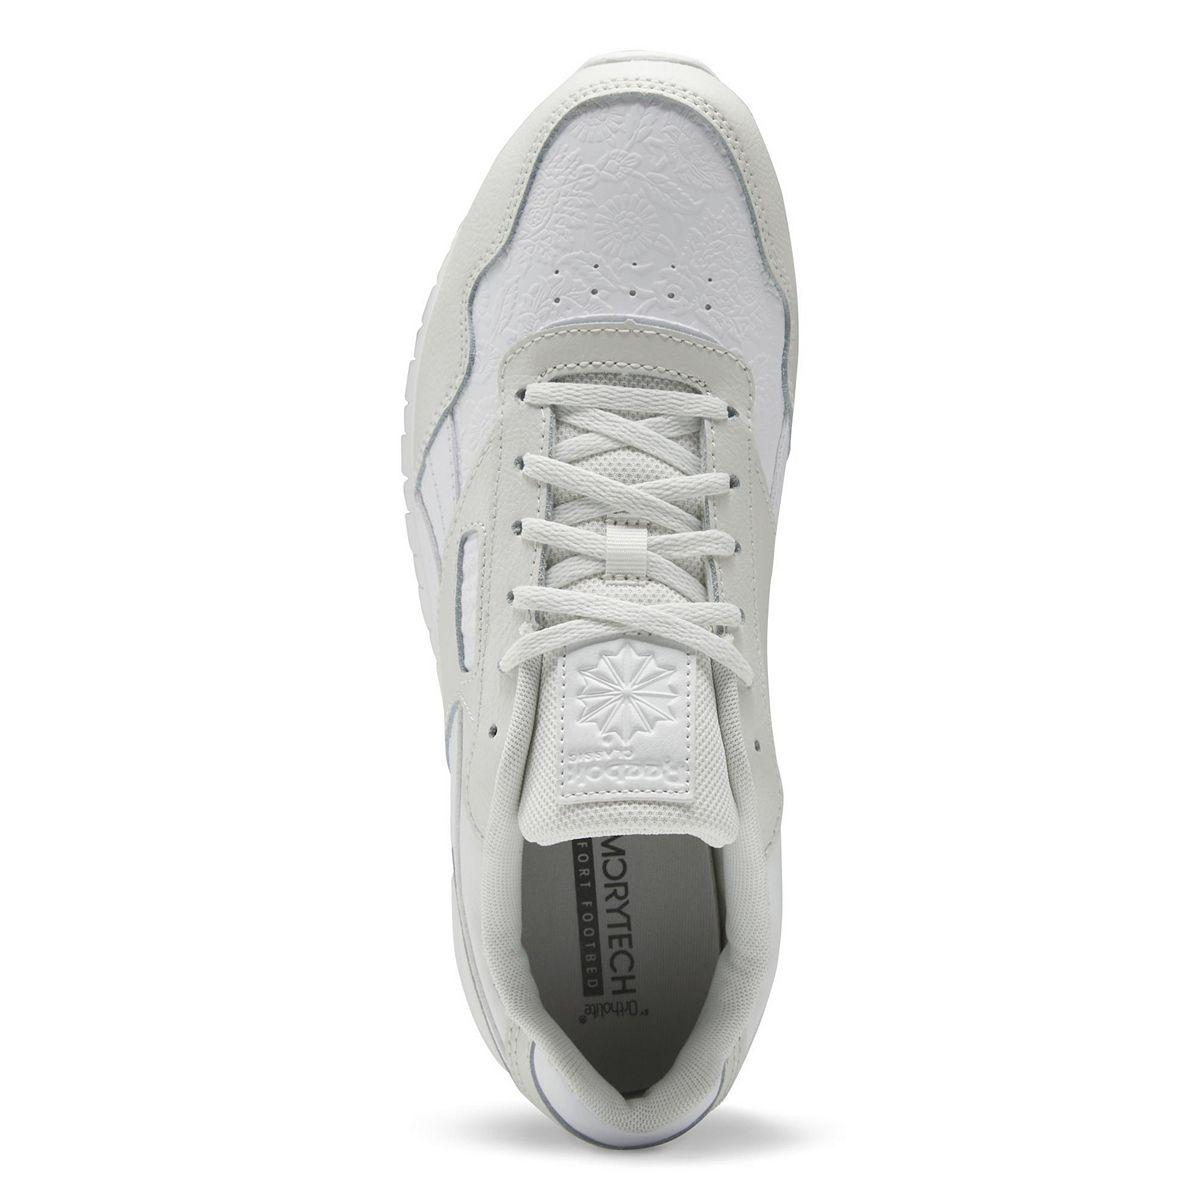 Reebok Classic Harman Run Women's Sneakers White Black iR63d